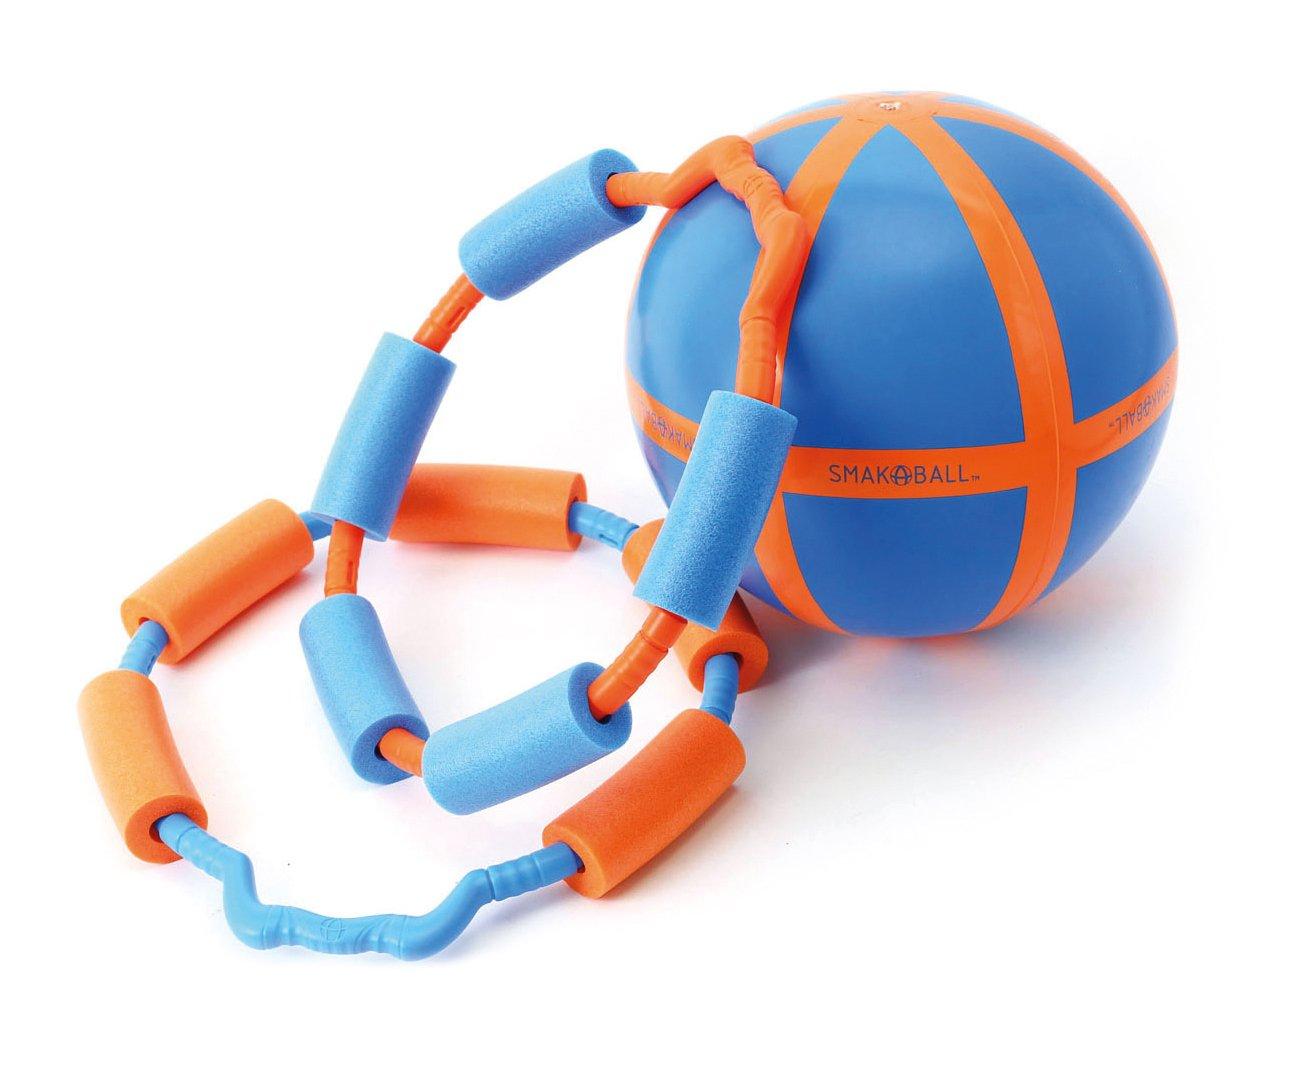 Smak-A-Ball Bola de /Ø 39 cm 2 Receptores F/áciles de Ensamblar